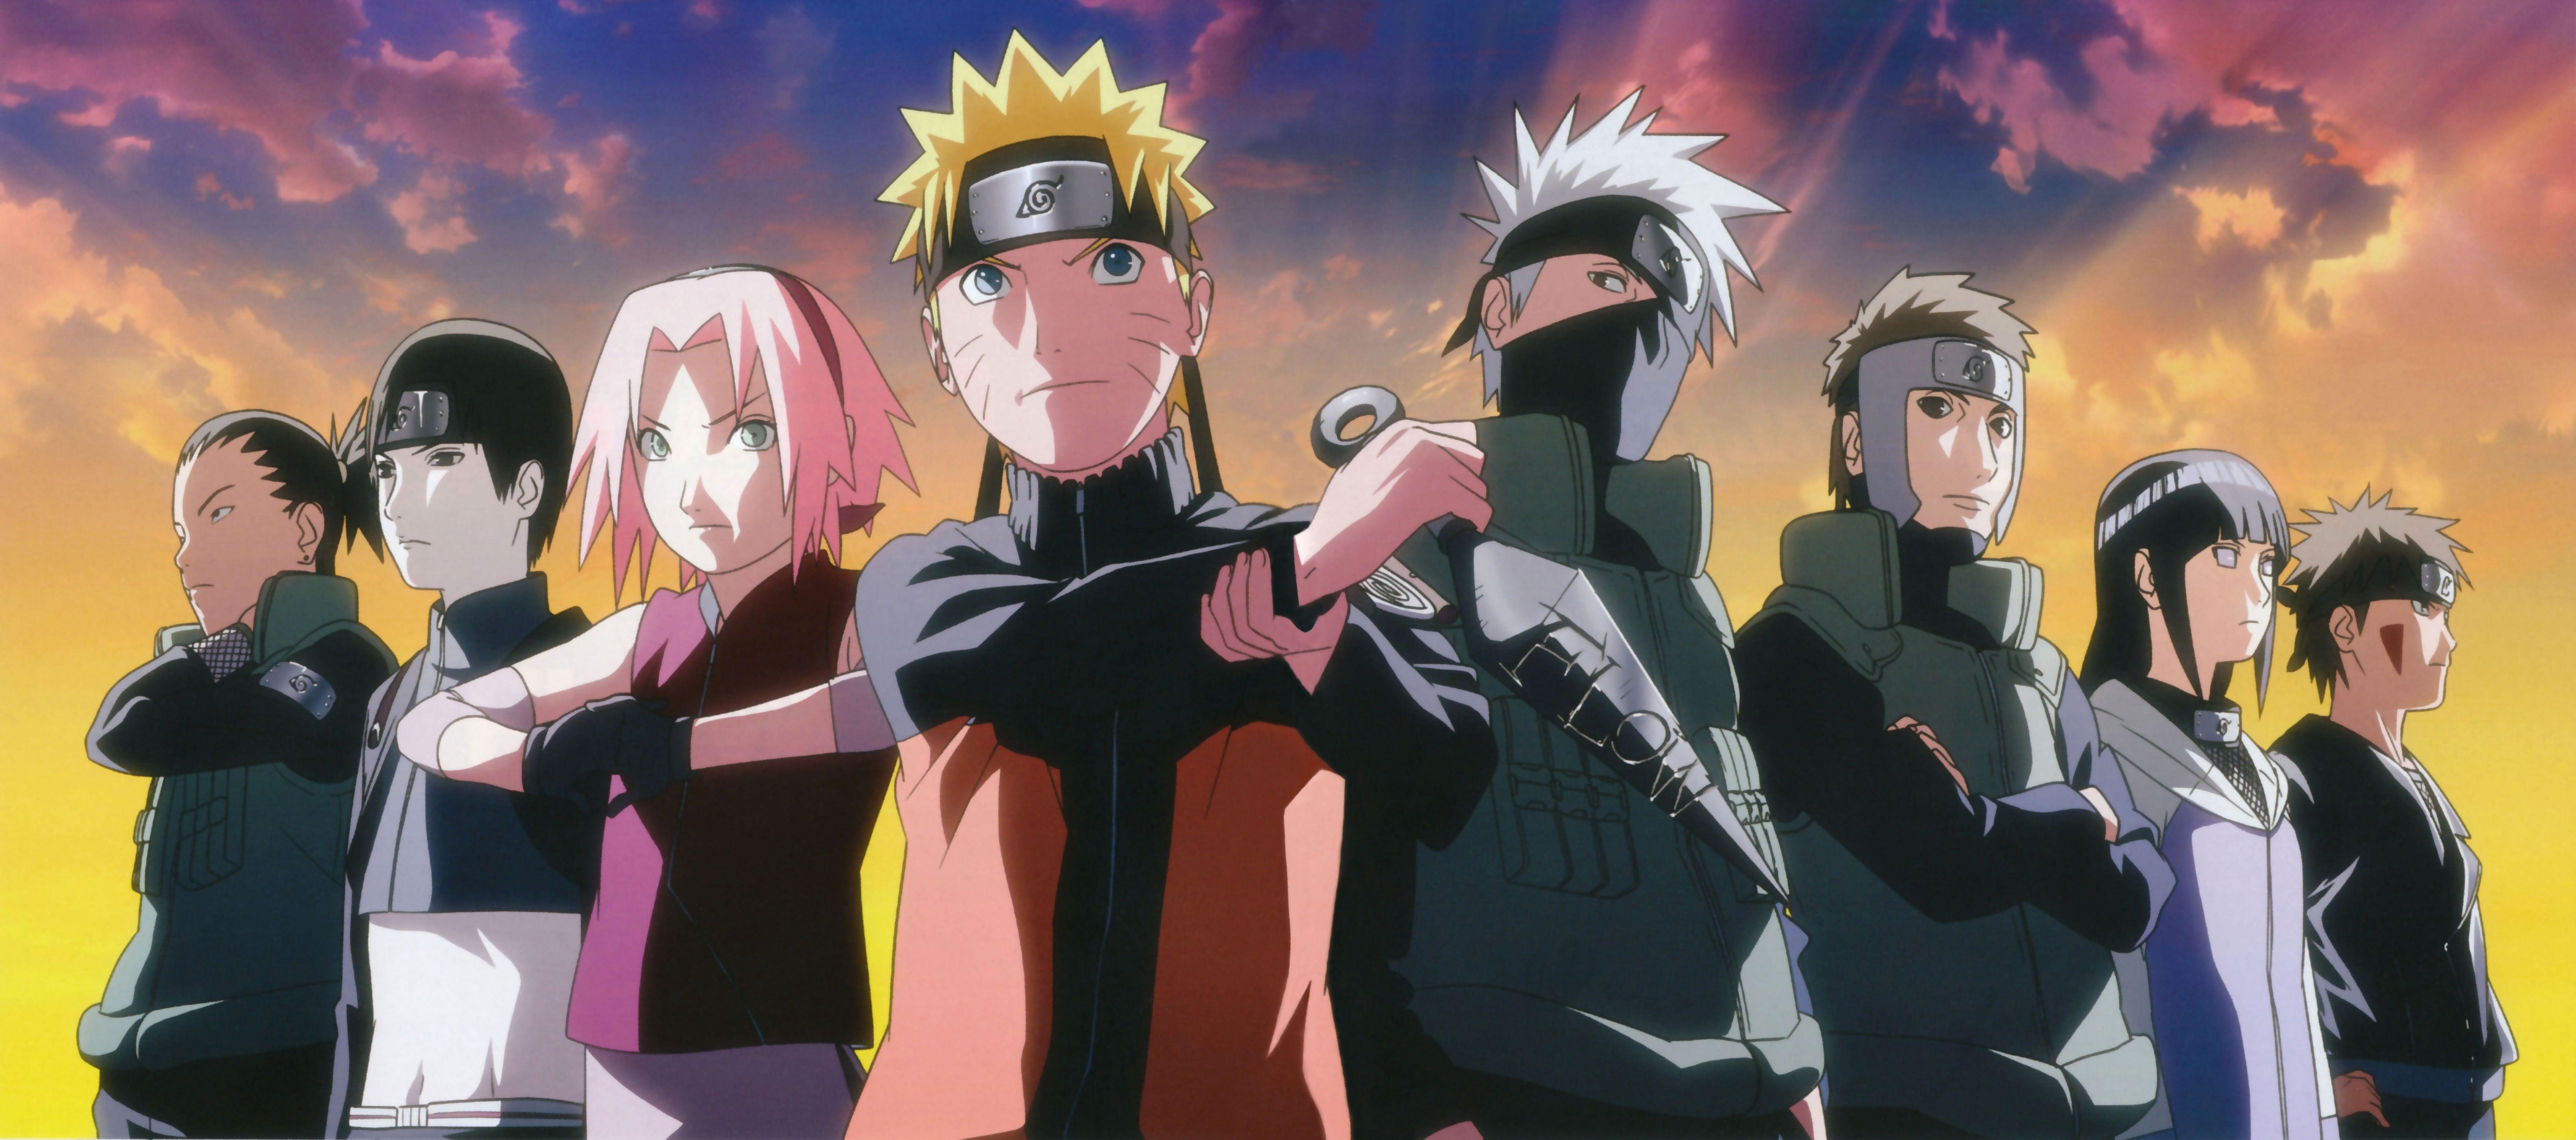 Naruto Shippuden All Characters Wallpapers - Top Free Naruto